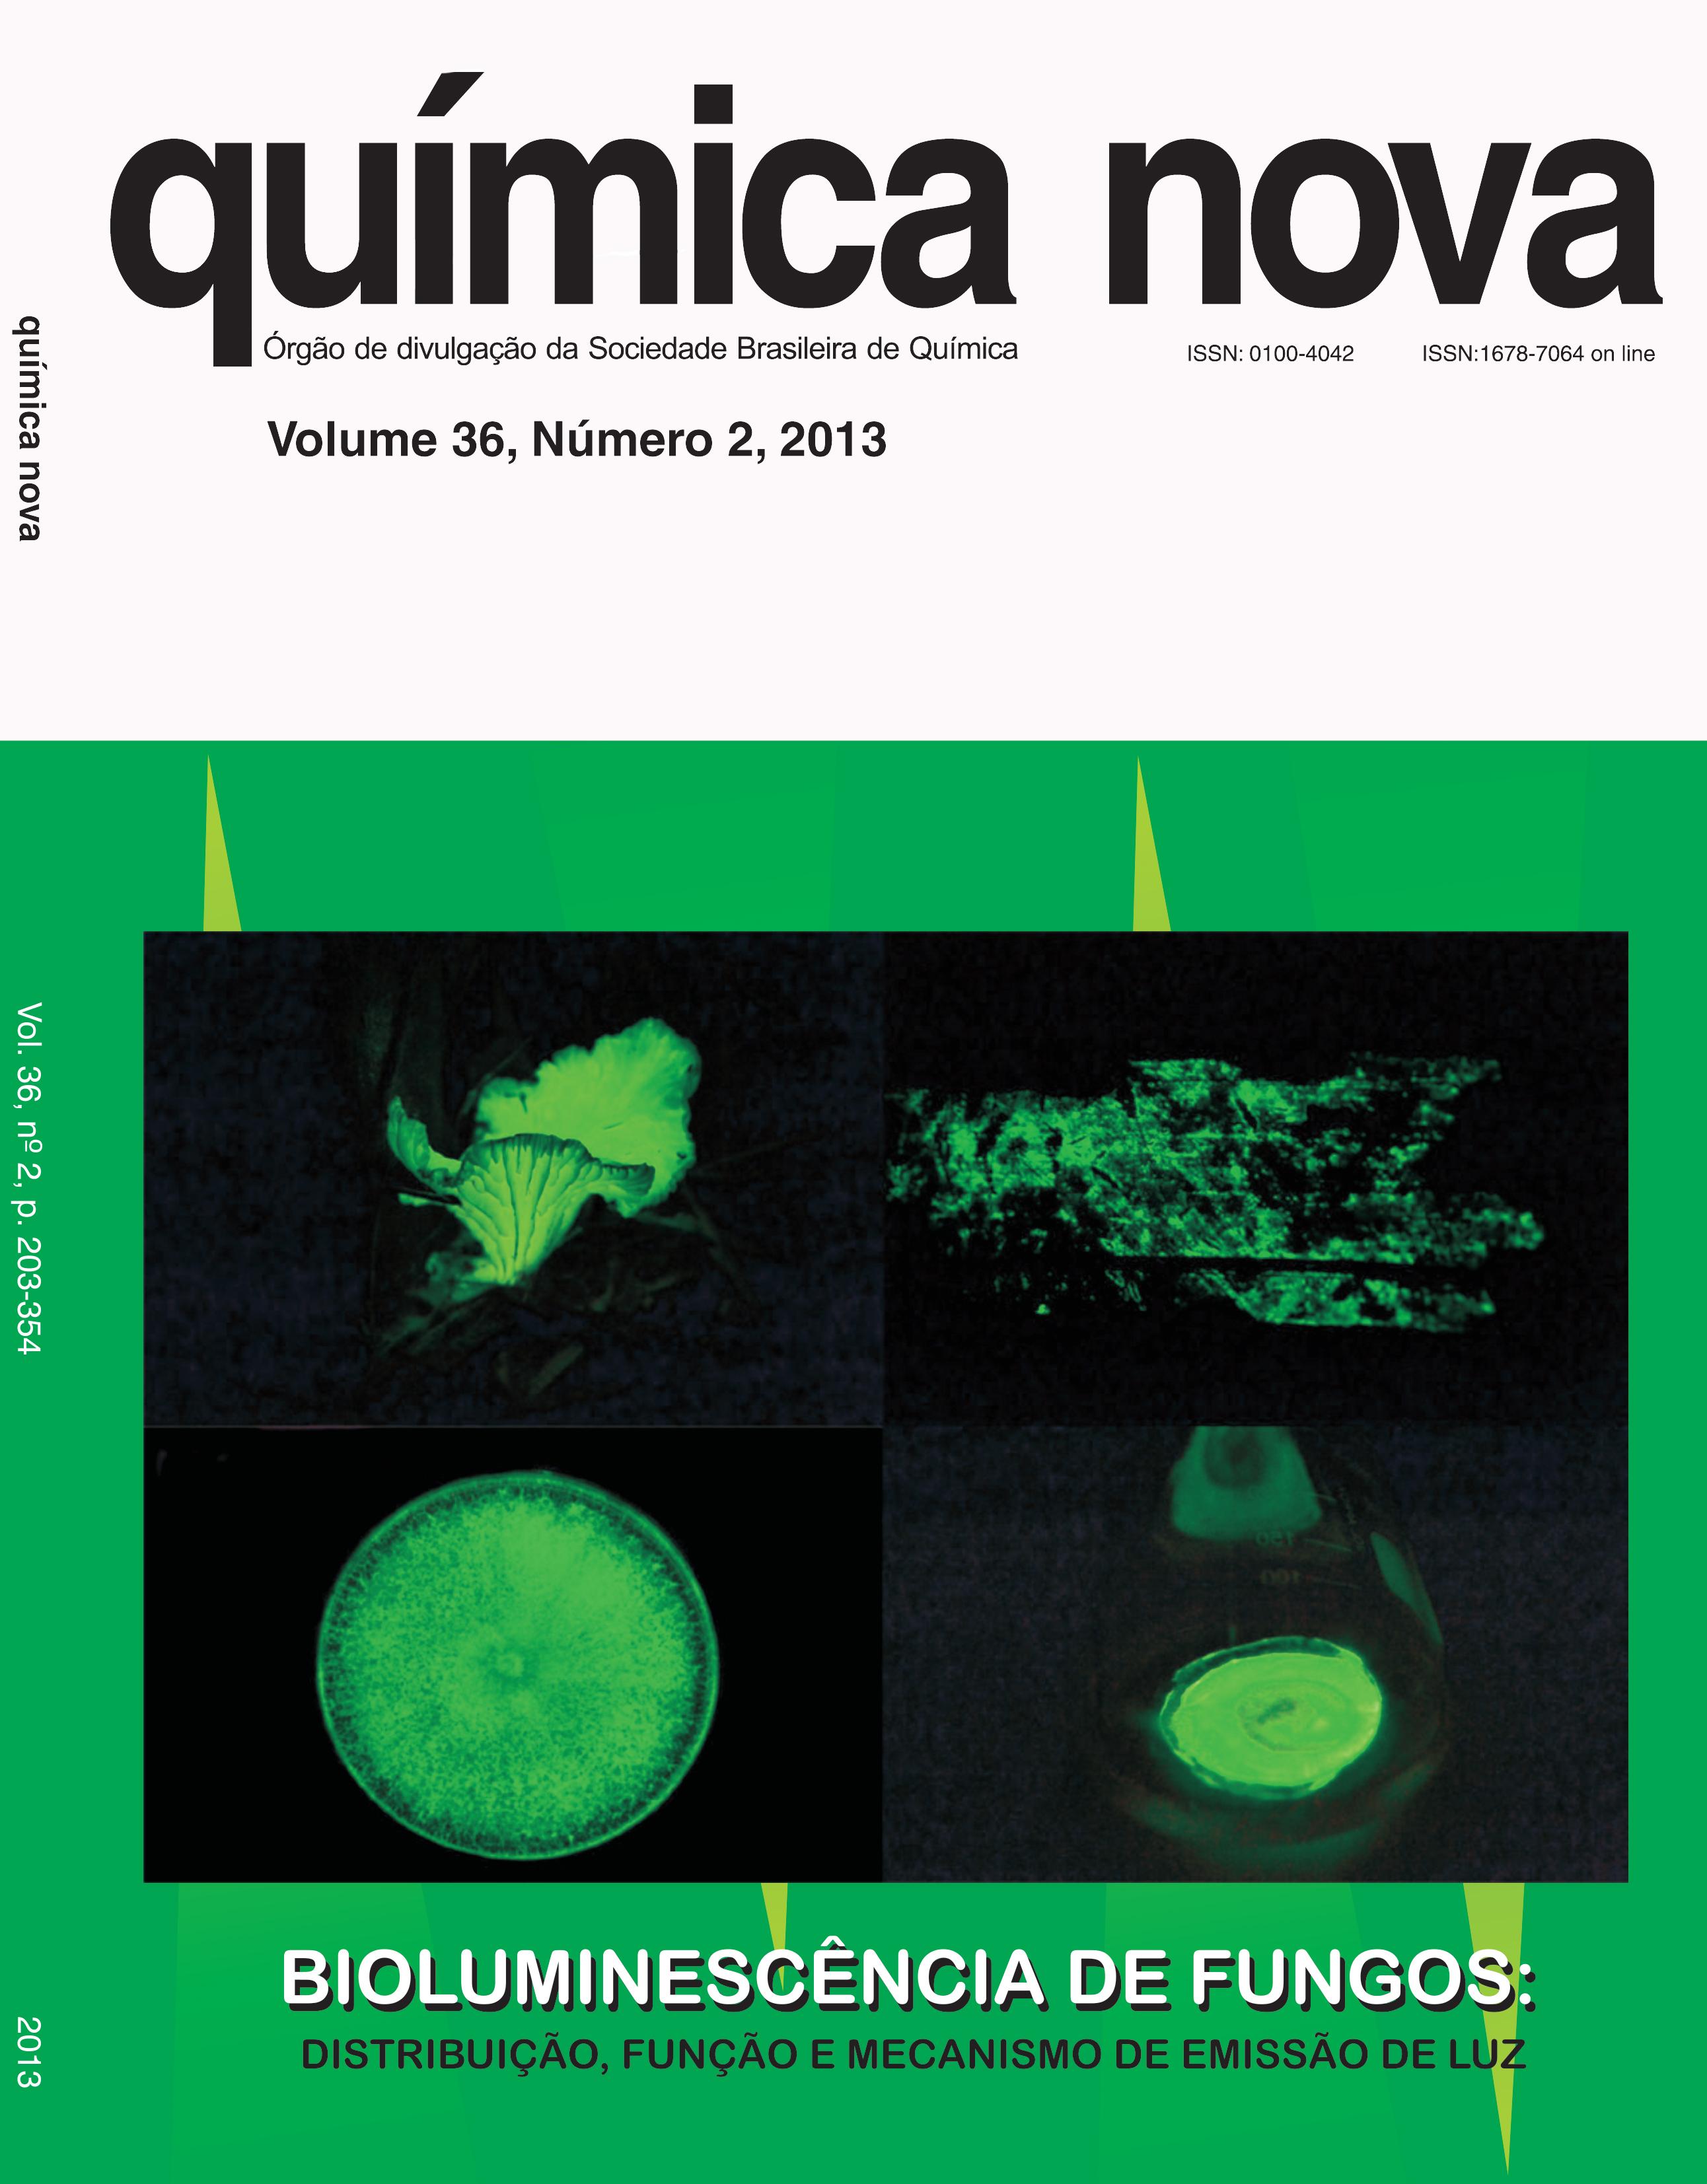 Química Nova cover